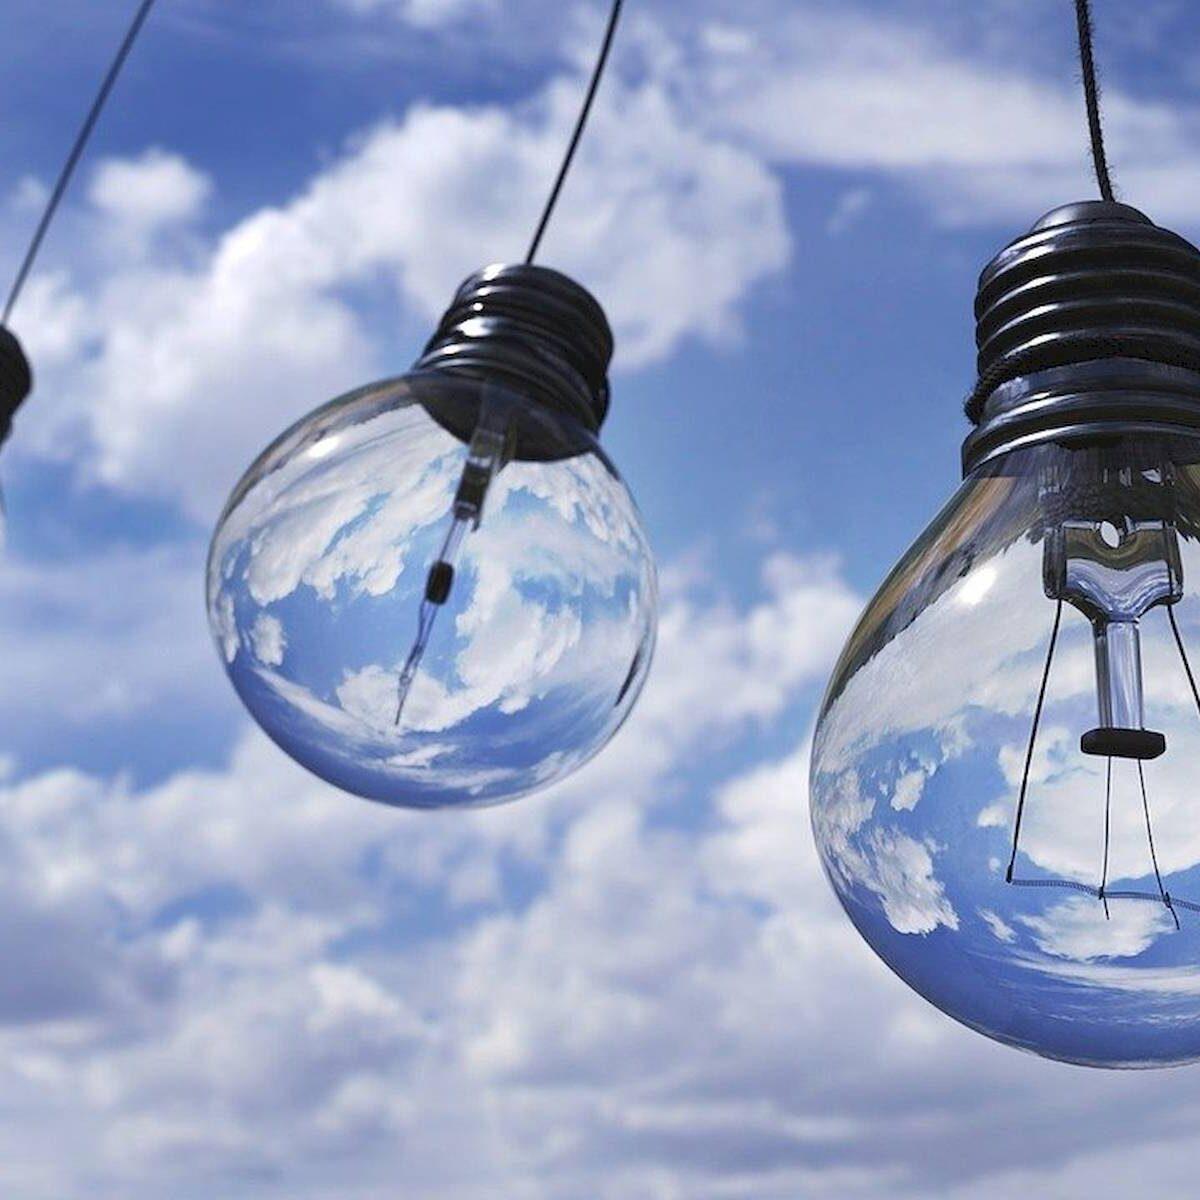 İstanbul BEDAŞ elektrik kesintisi 27 Haziran Pazar   İstanbul AYEDAŞ elektrik kesintisi 27 Haziran 2021 Pazar